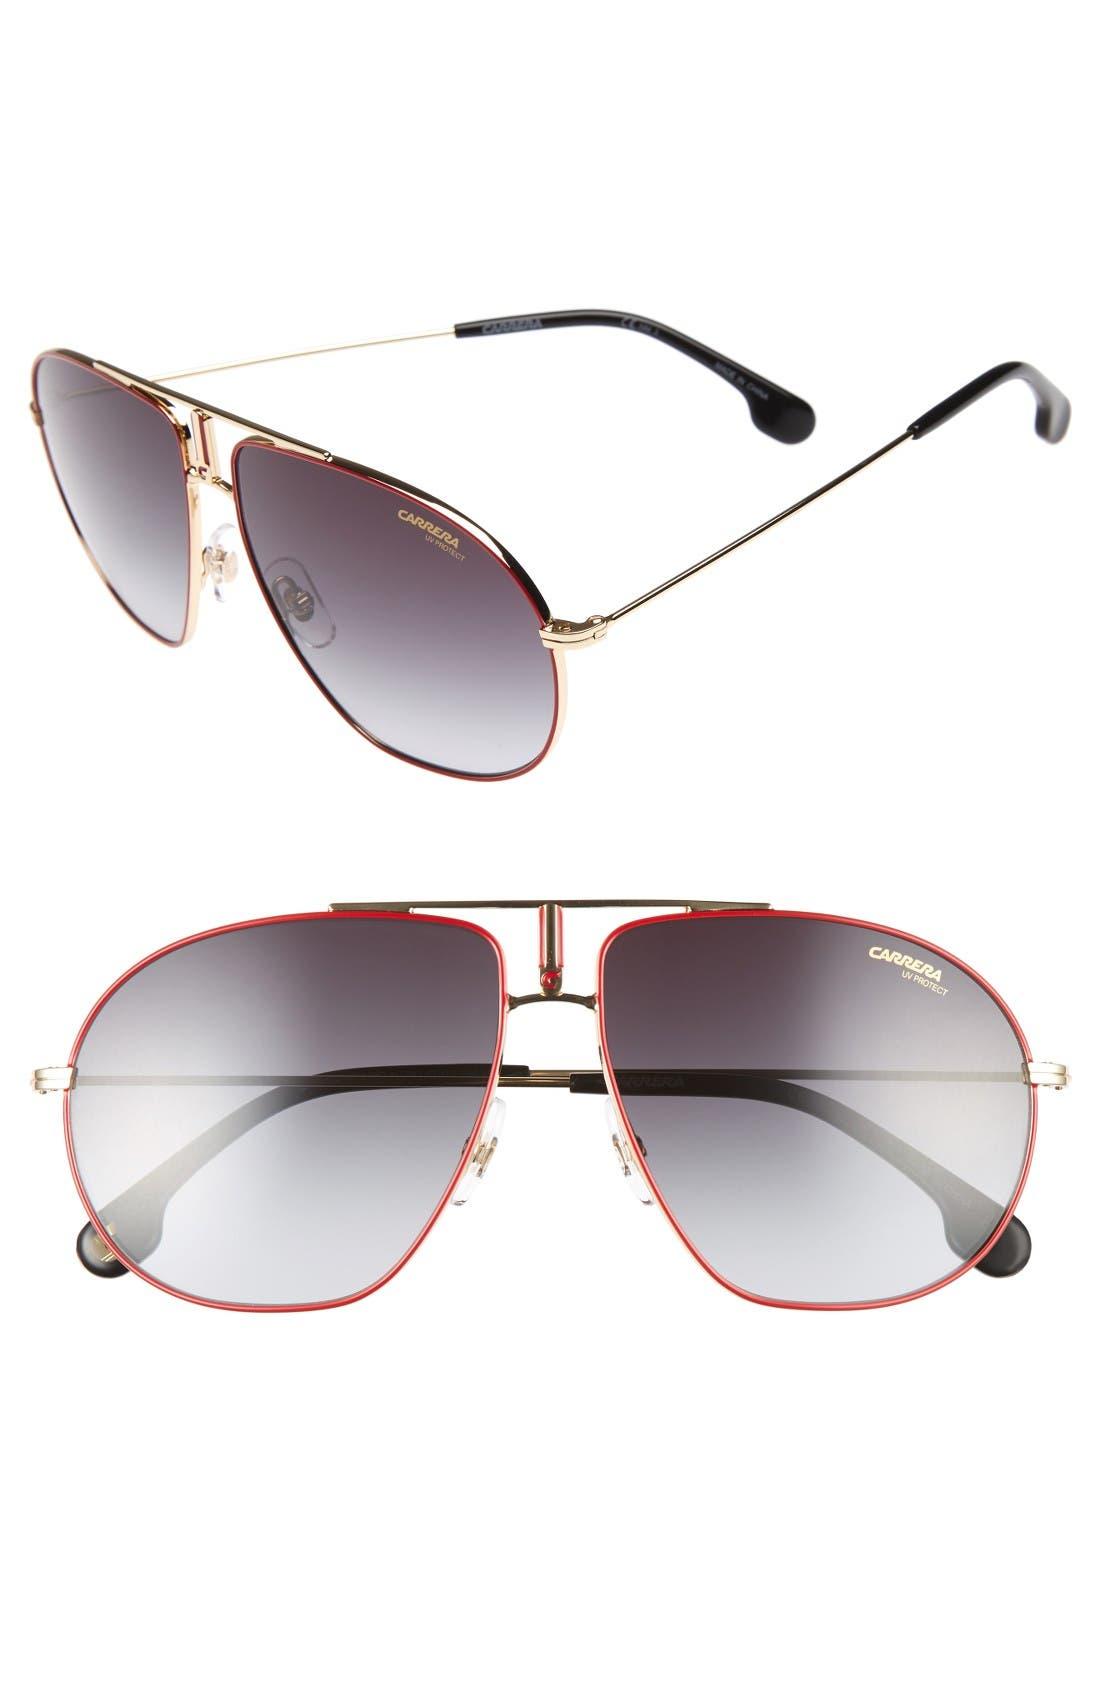 Main Image - Carrera Bound 62mm Sunglasses